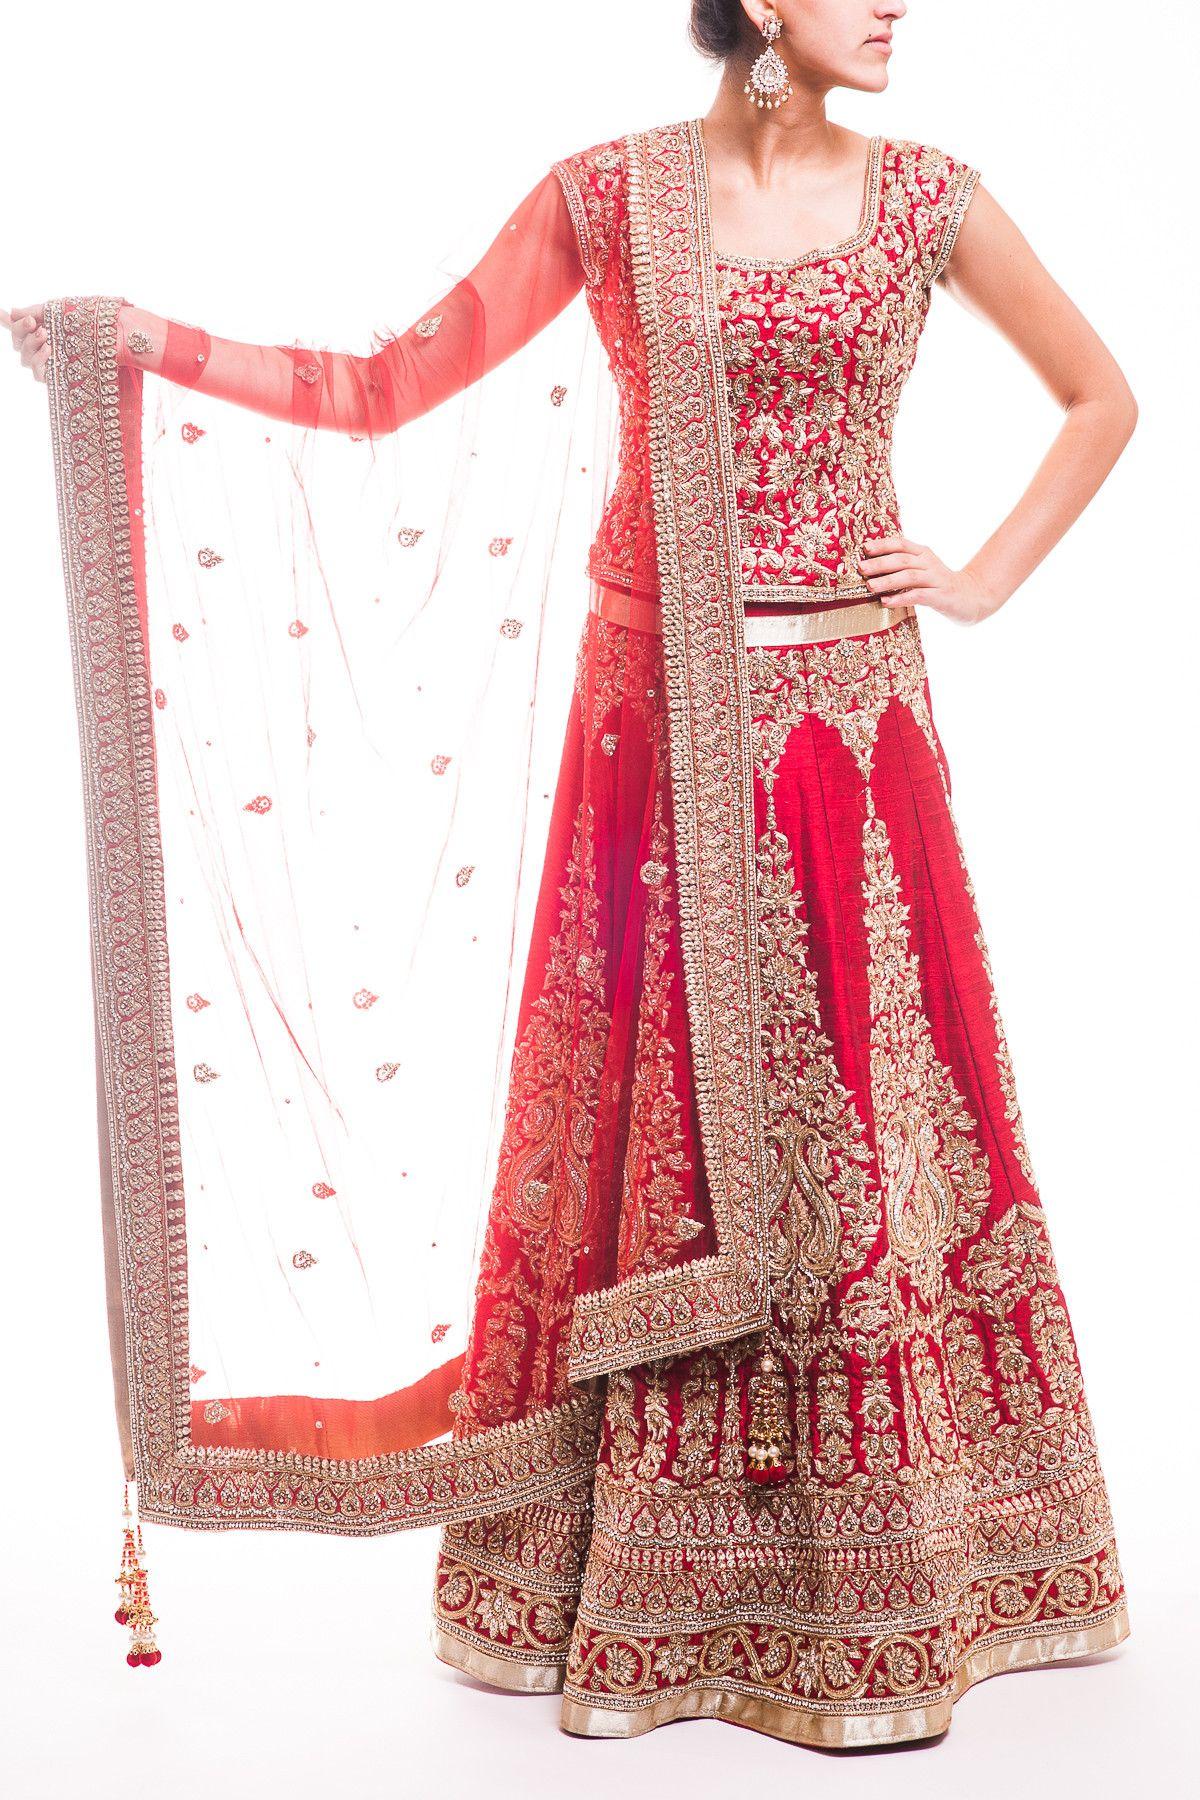 Traditional Deep Red Bridal Lehenga | Bridal | Pinterest